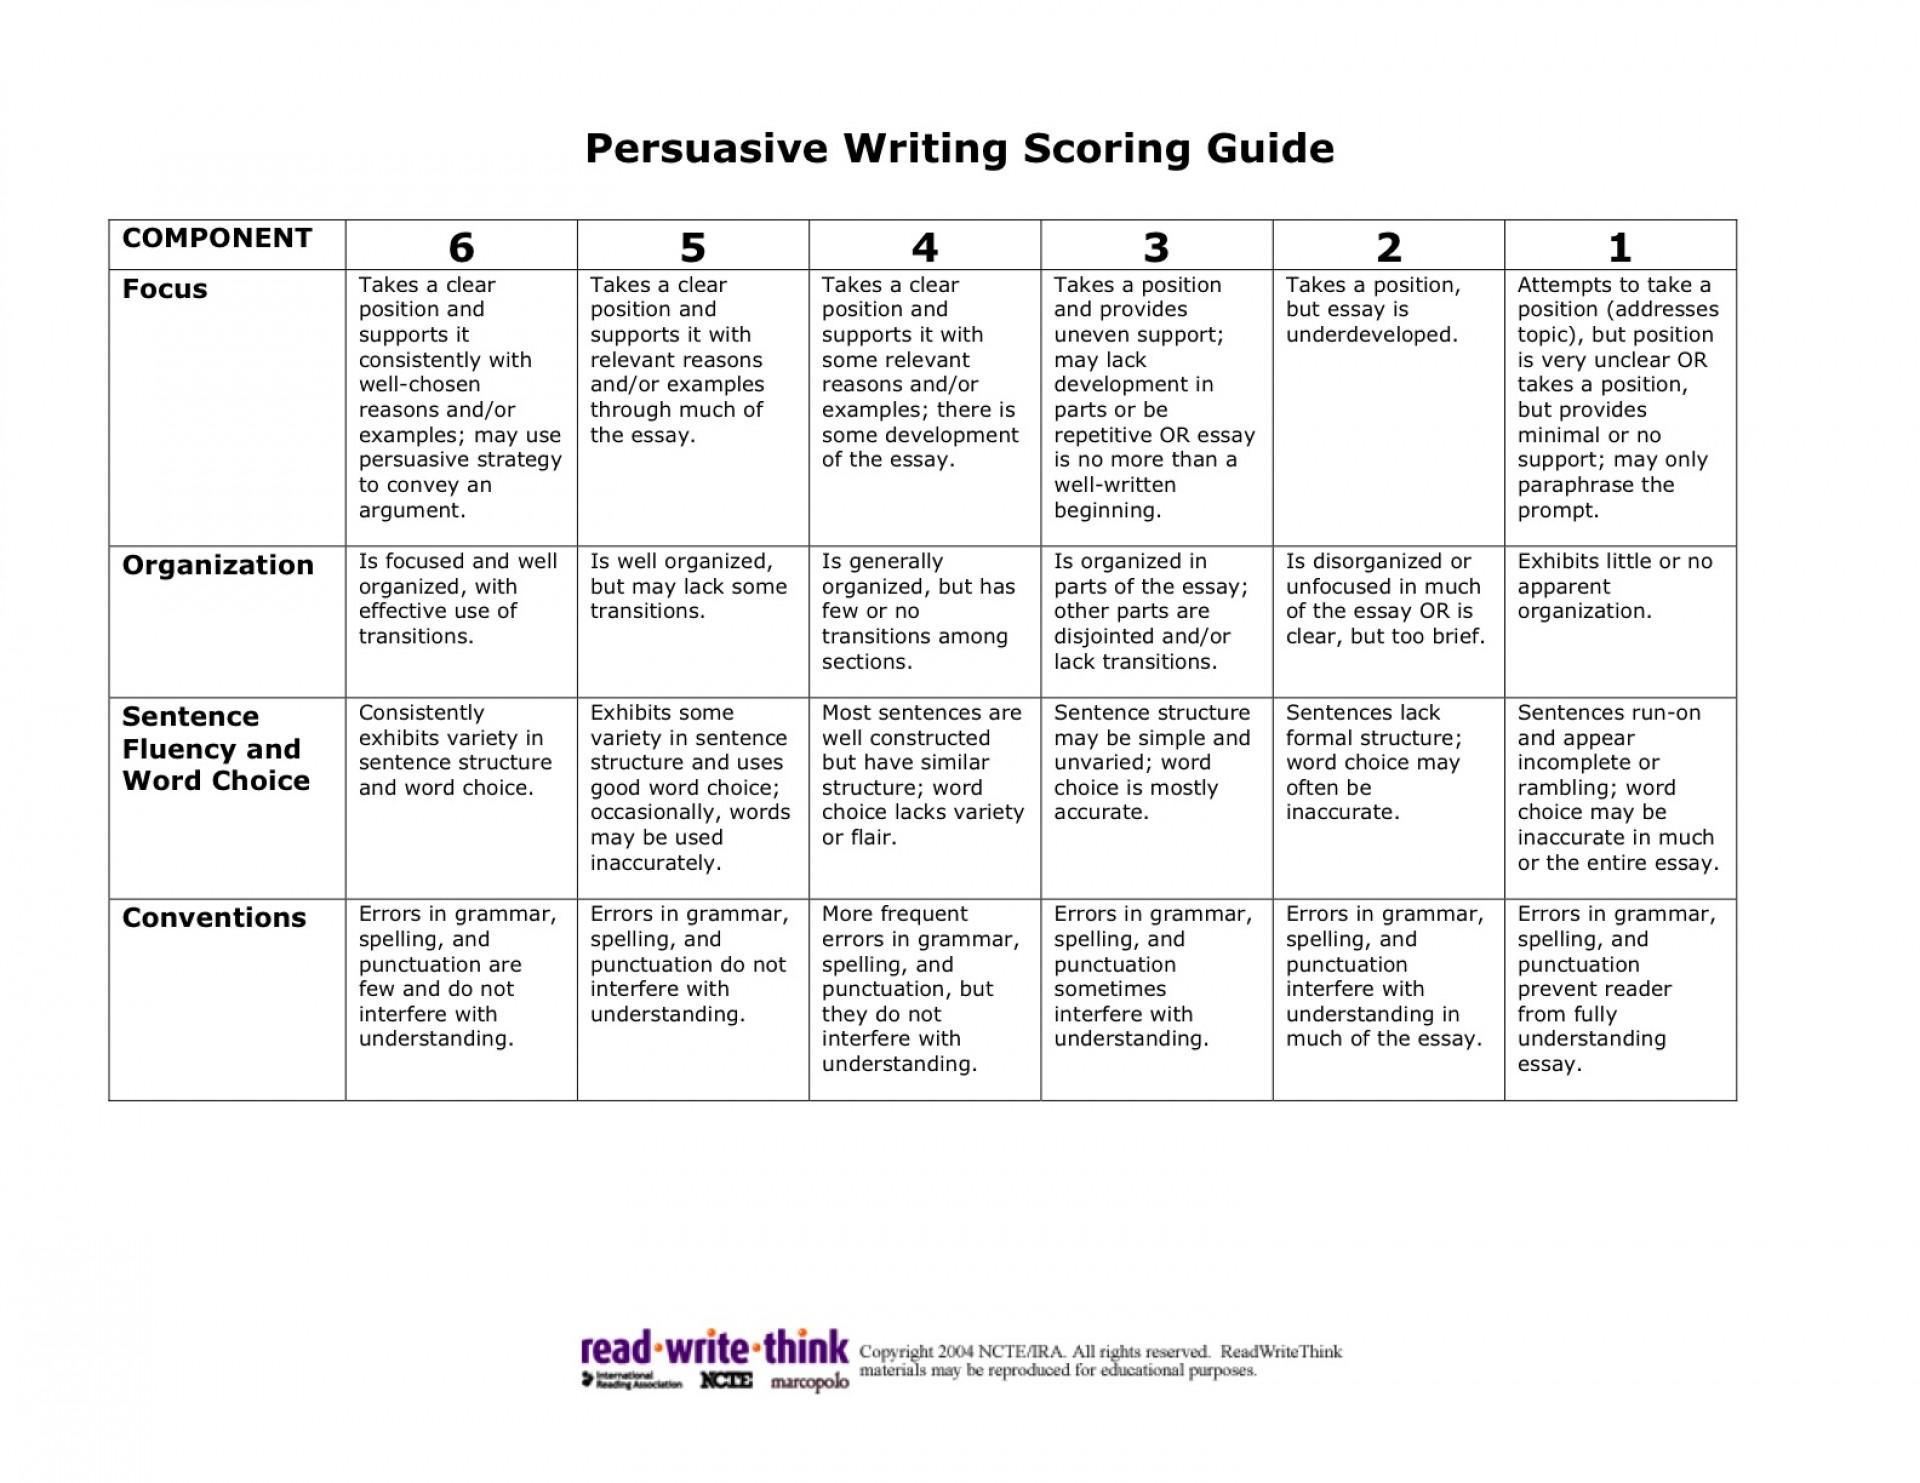 018 Rubrics In Essay Writing Persuasivewritingscoringguide Formidable Holistic For Pdf Rubric Middle School 1920